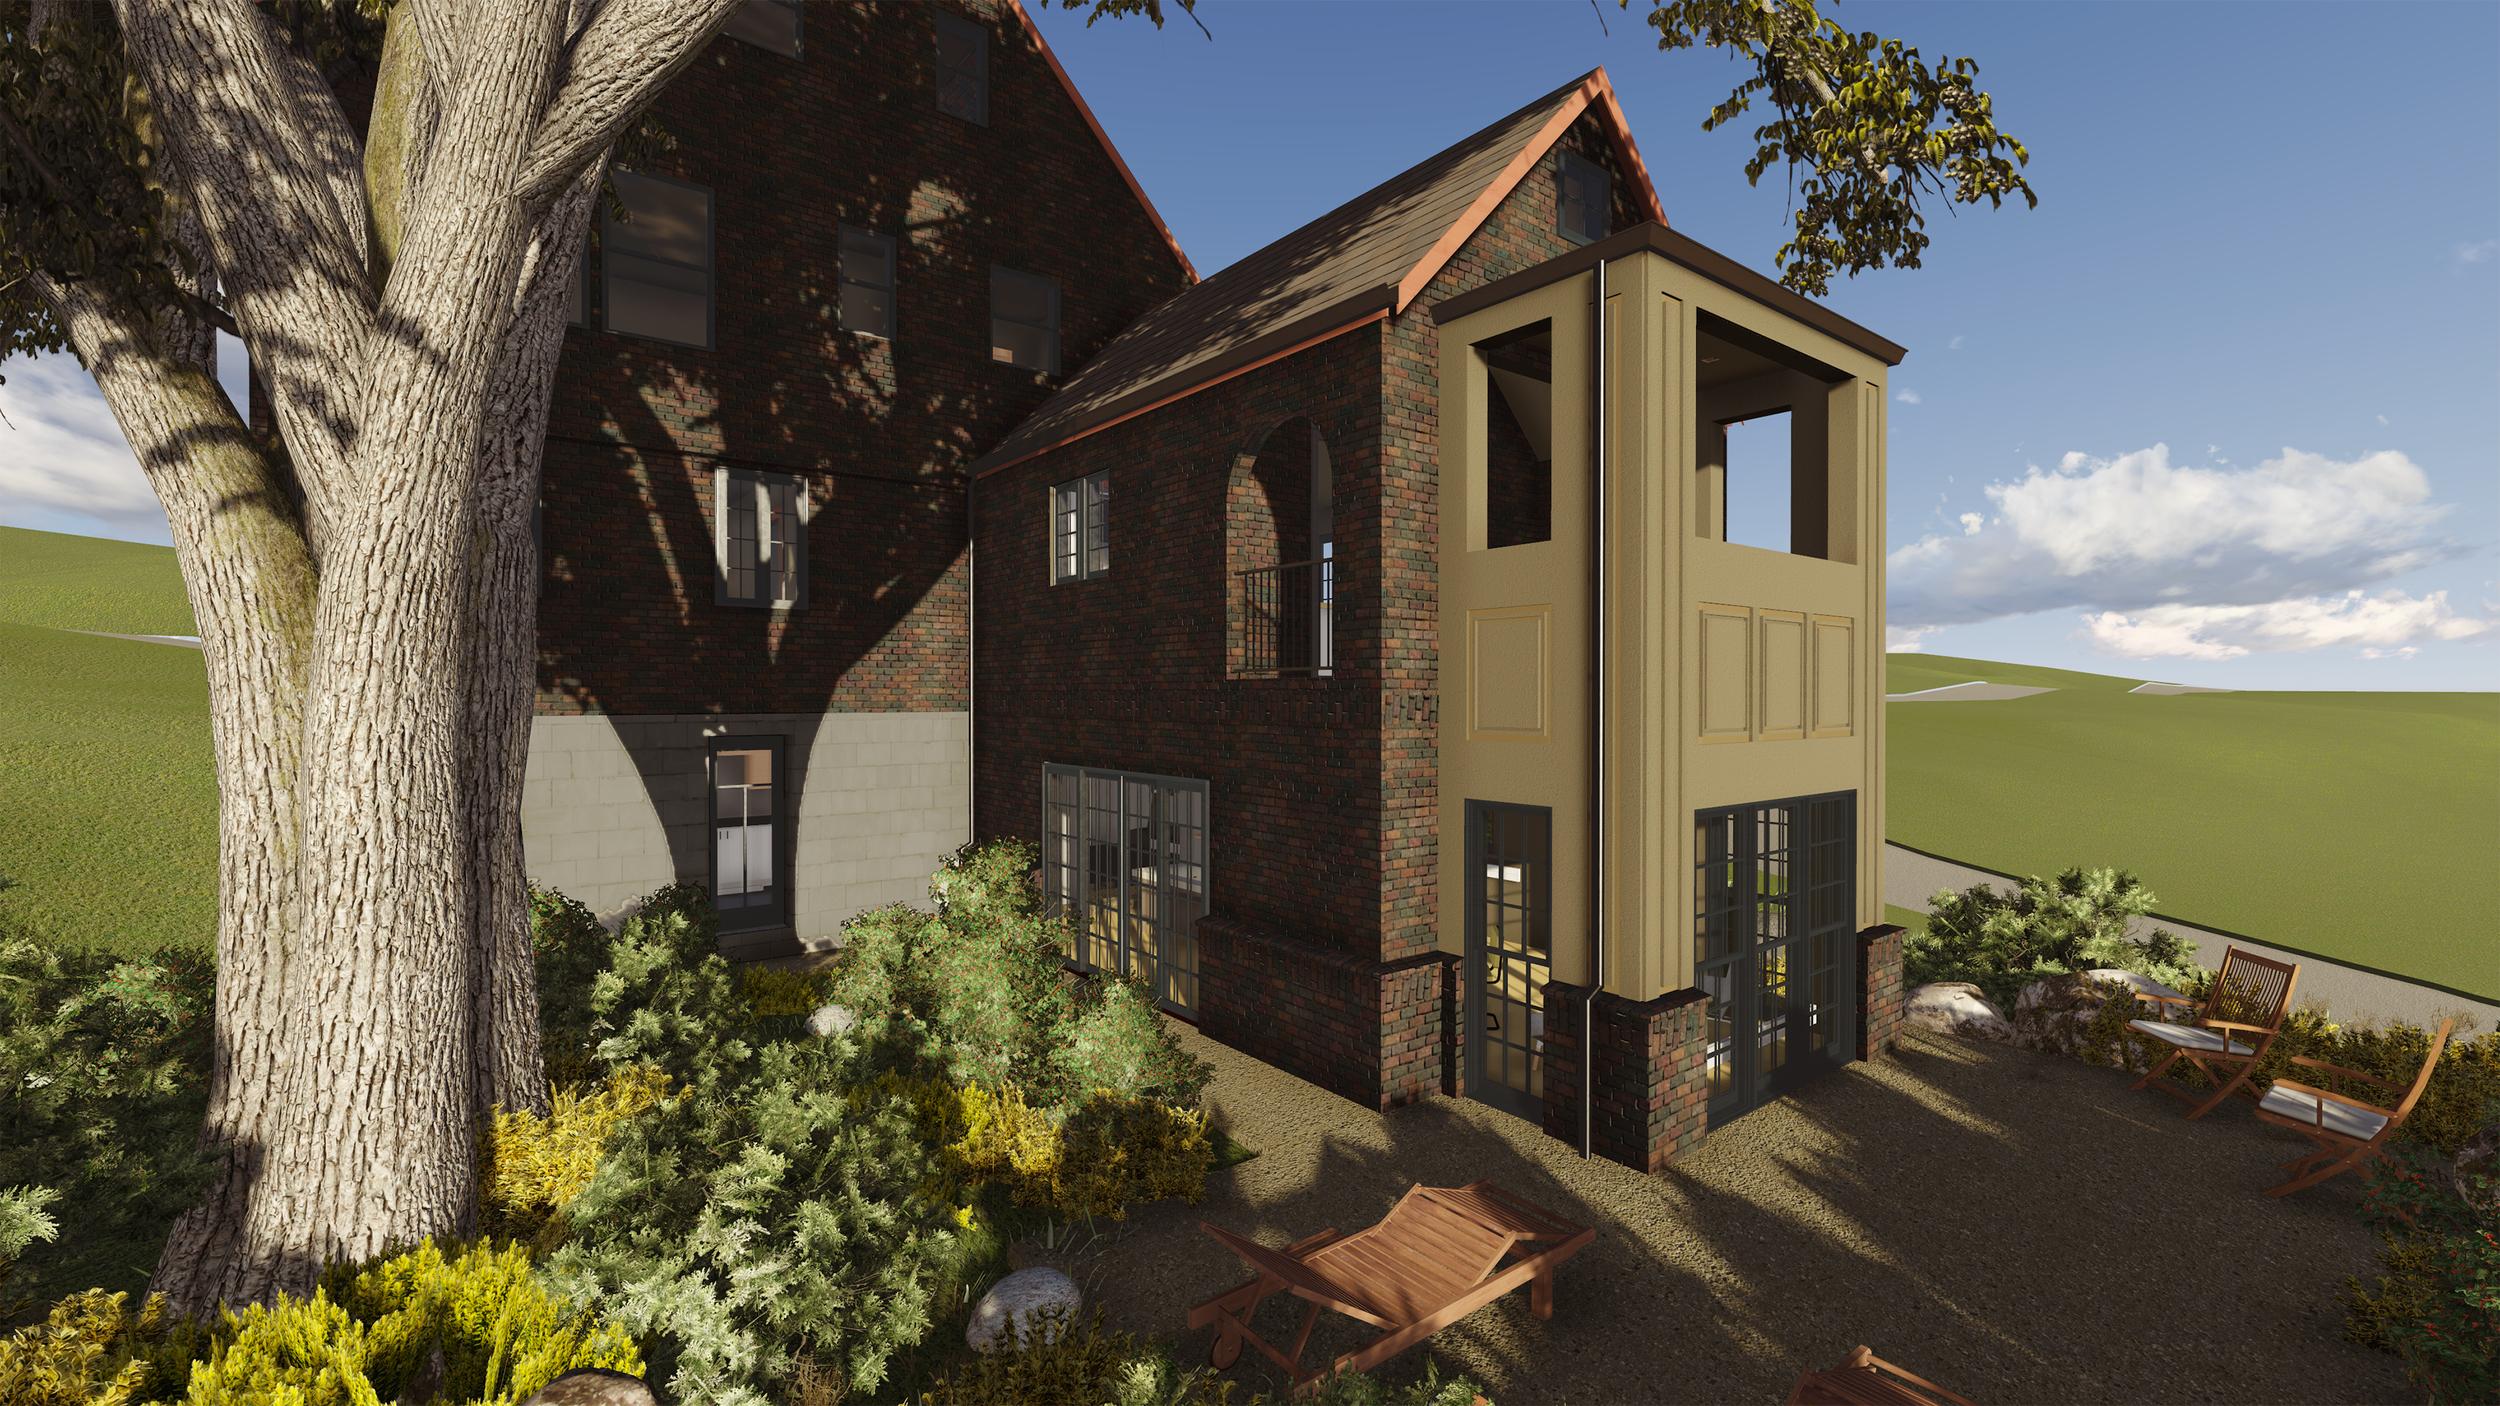 PROCESS: Exterior Finish Design Option 1